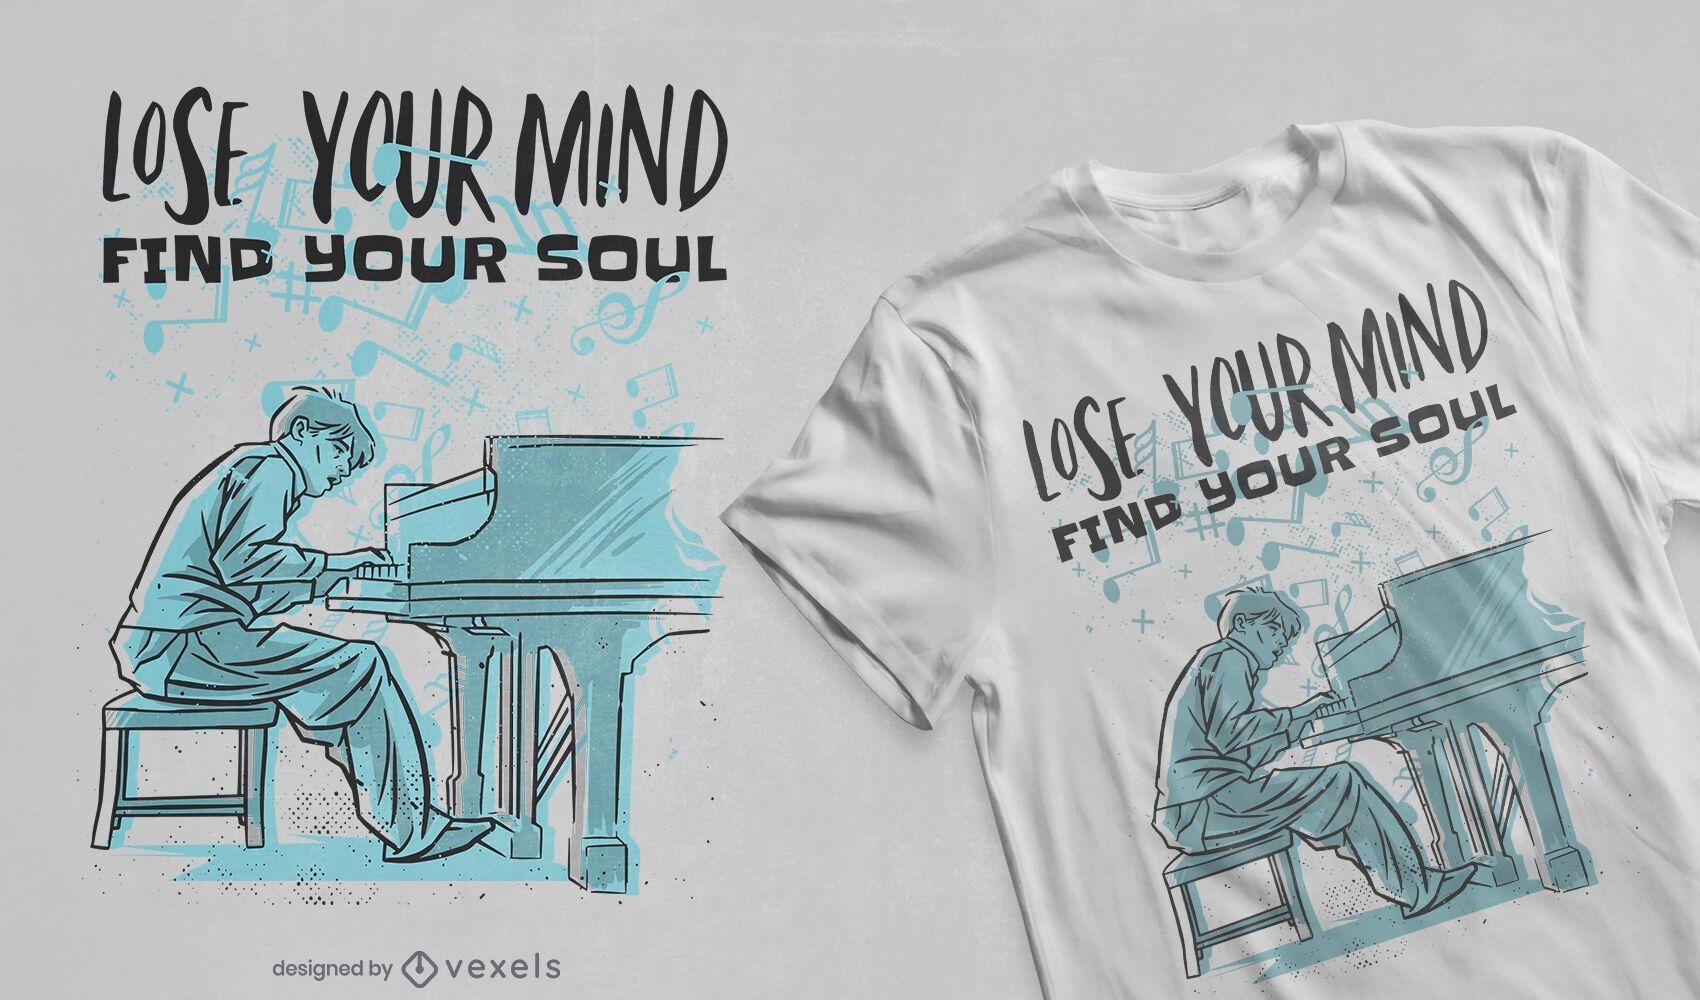 Find your soul t-shirt design